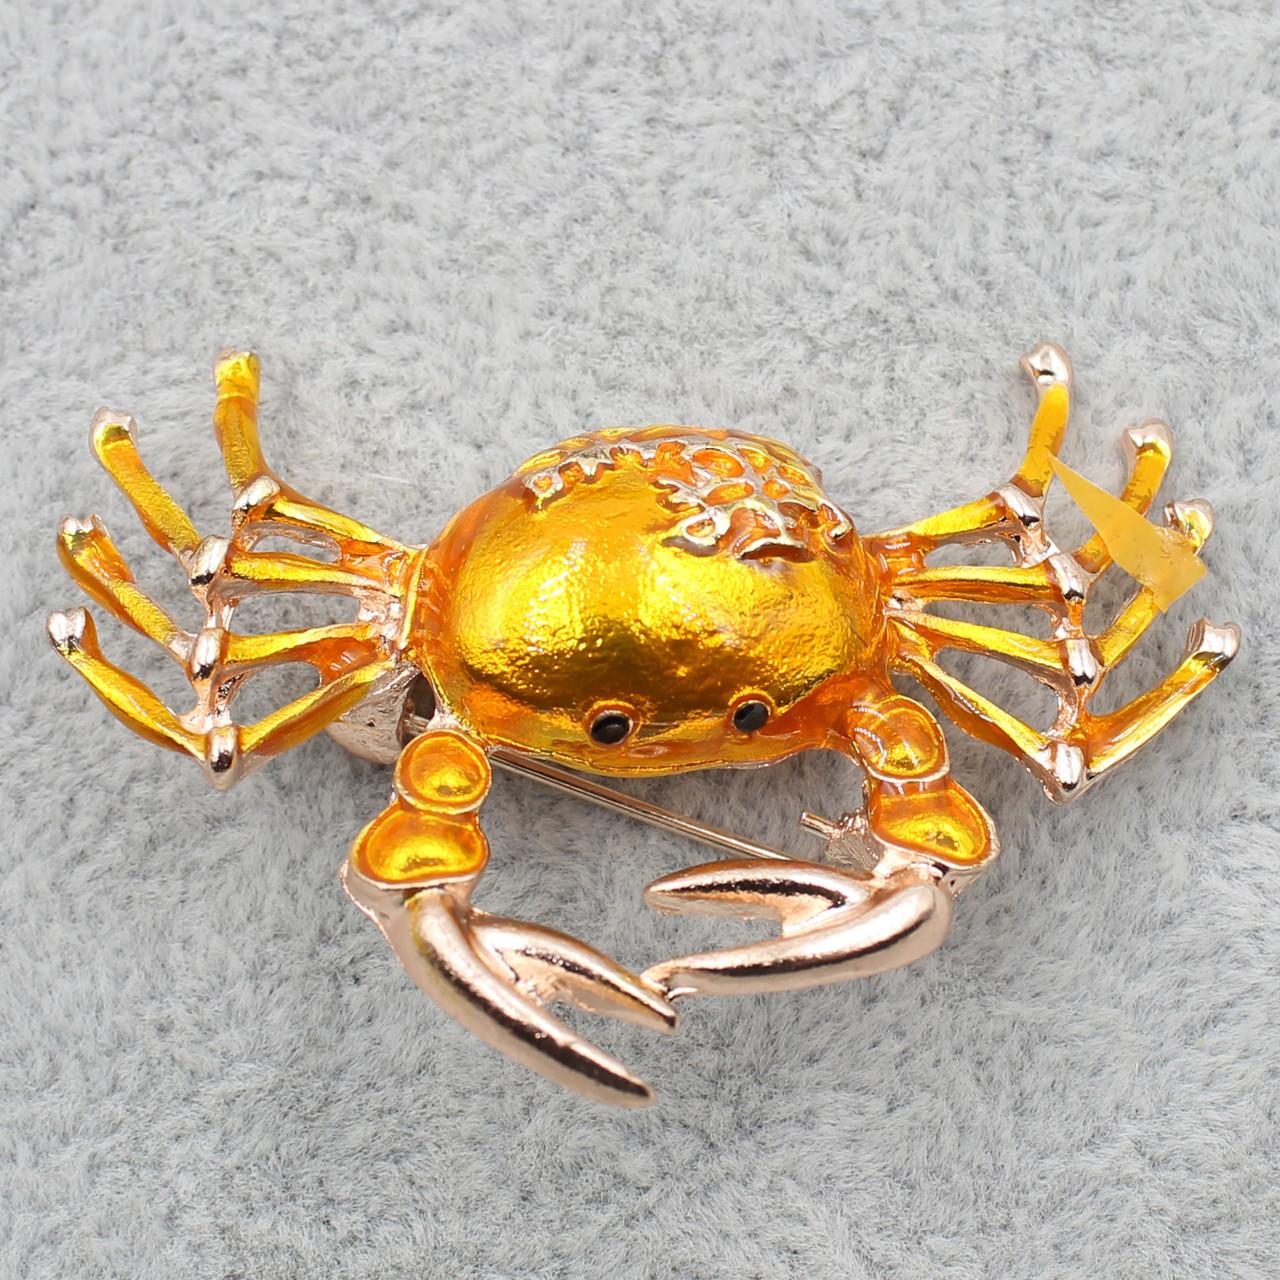 Брошь Крабик цветная эмаль 35х50 мм